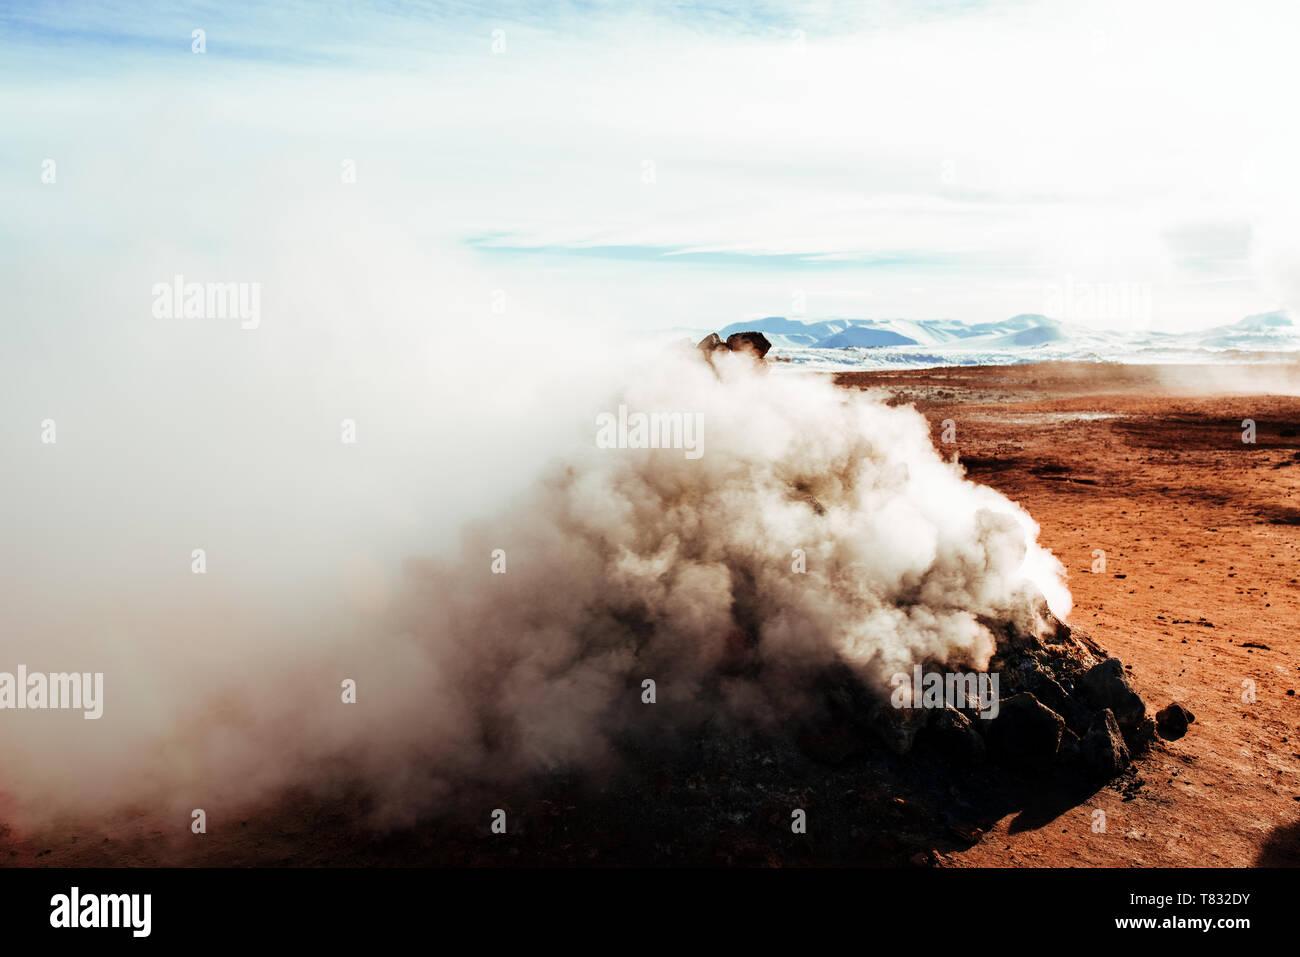 Smoking fumaroles, Námafjall Hverir, Ábær, Skagafjardarsysla, Iceland - Stock Image